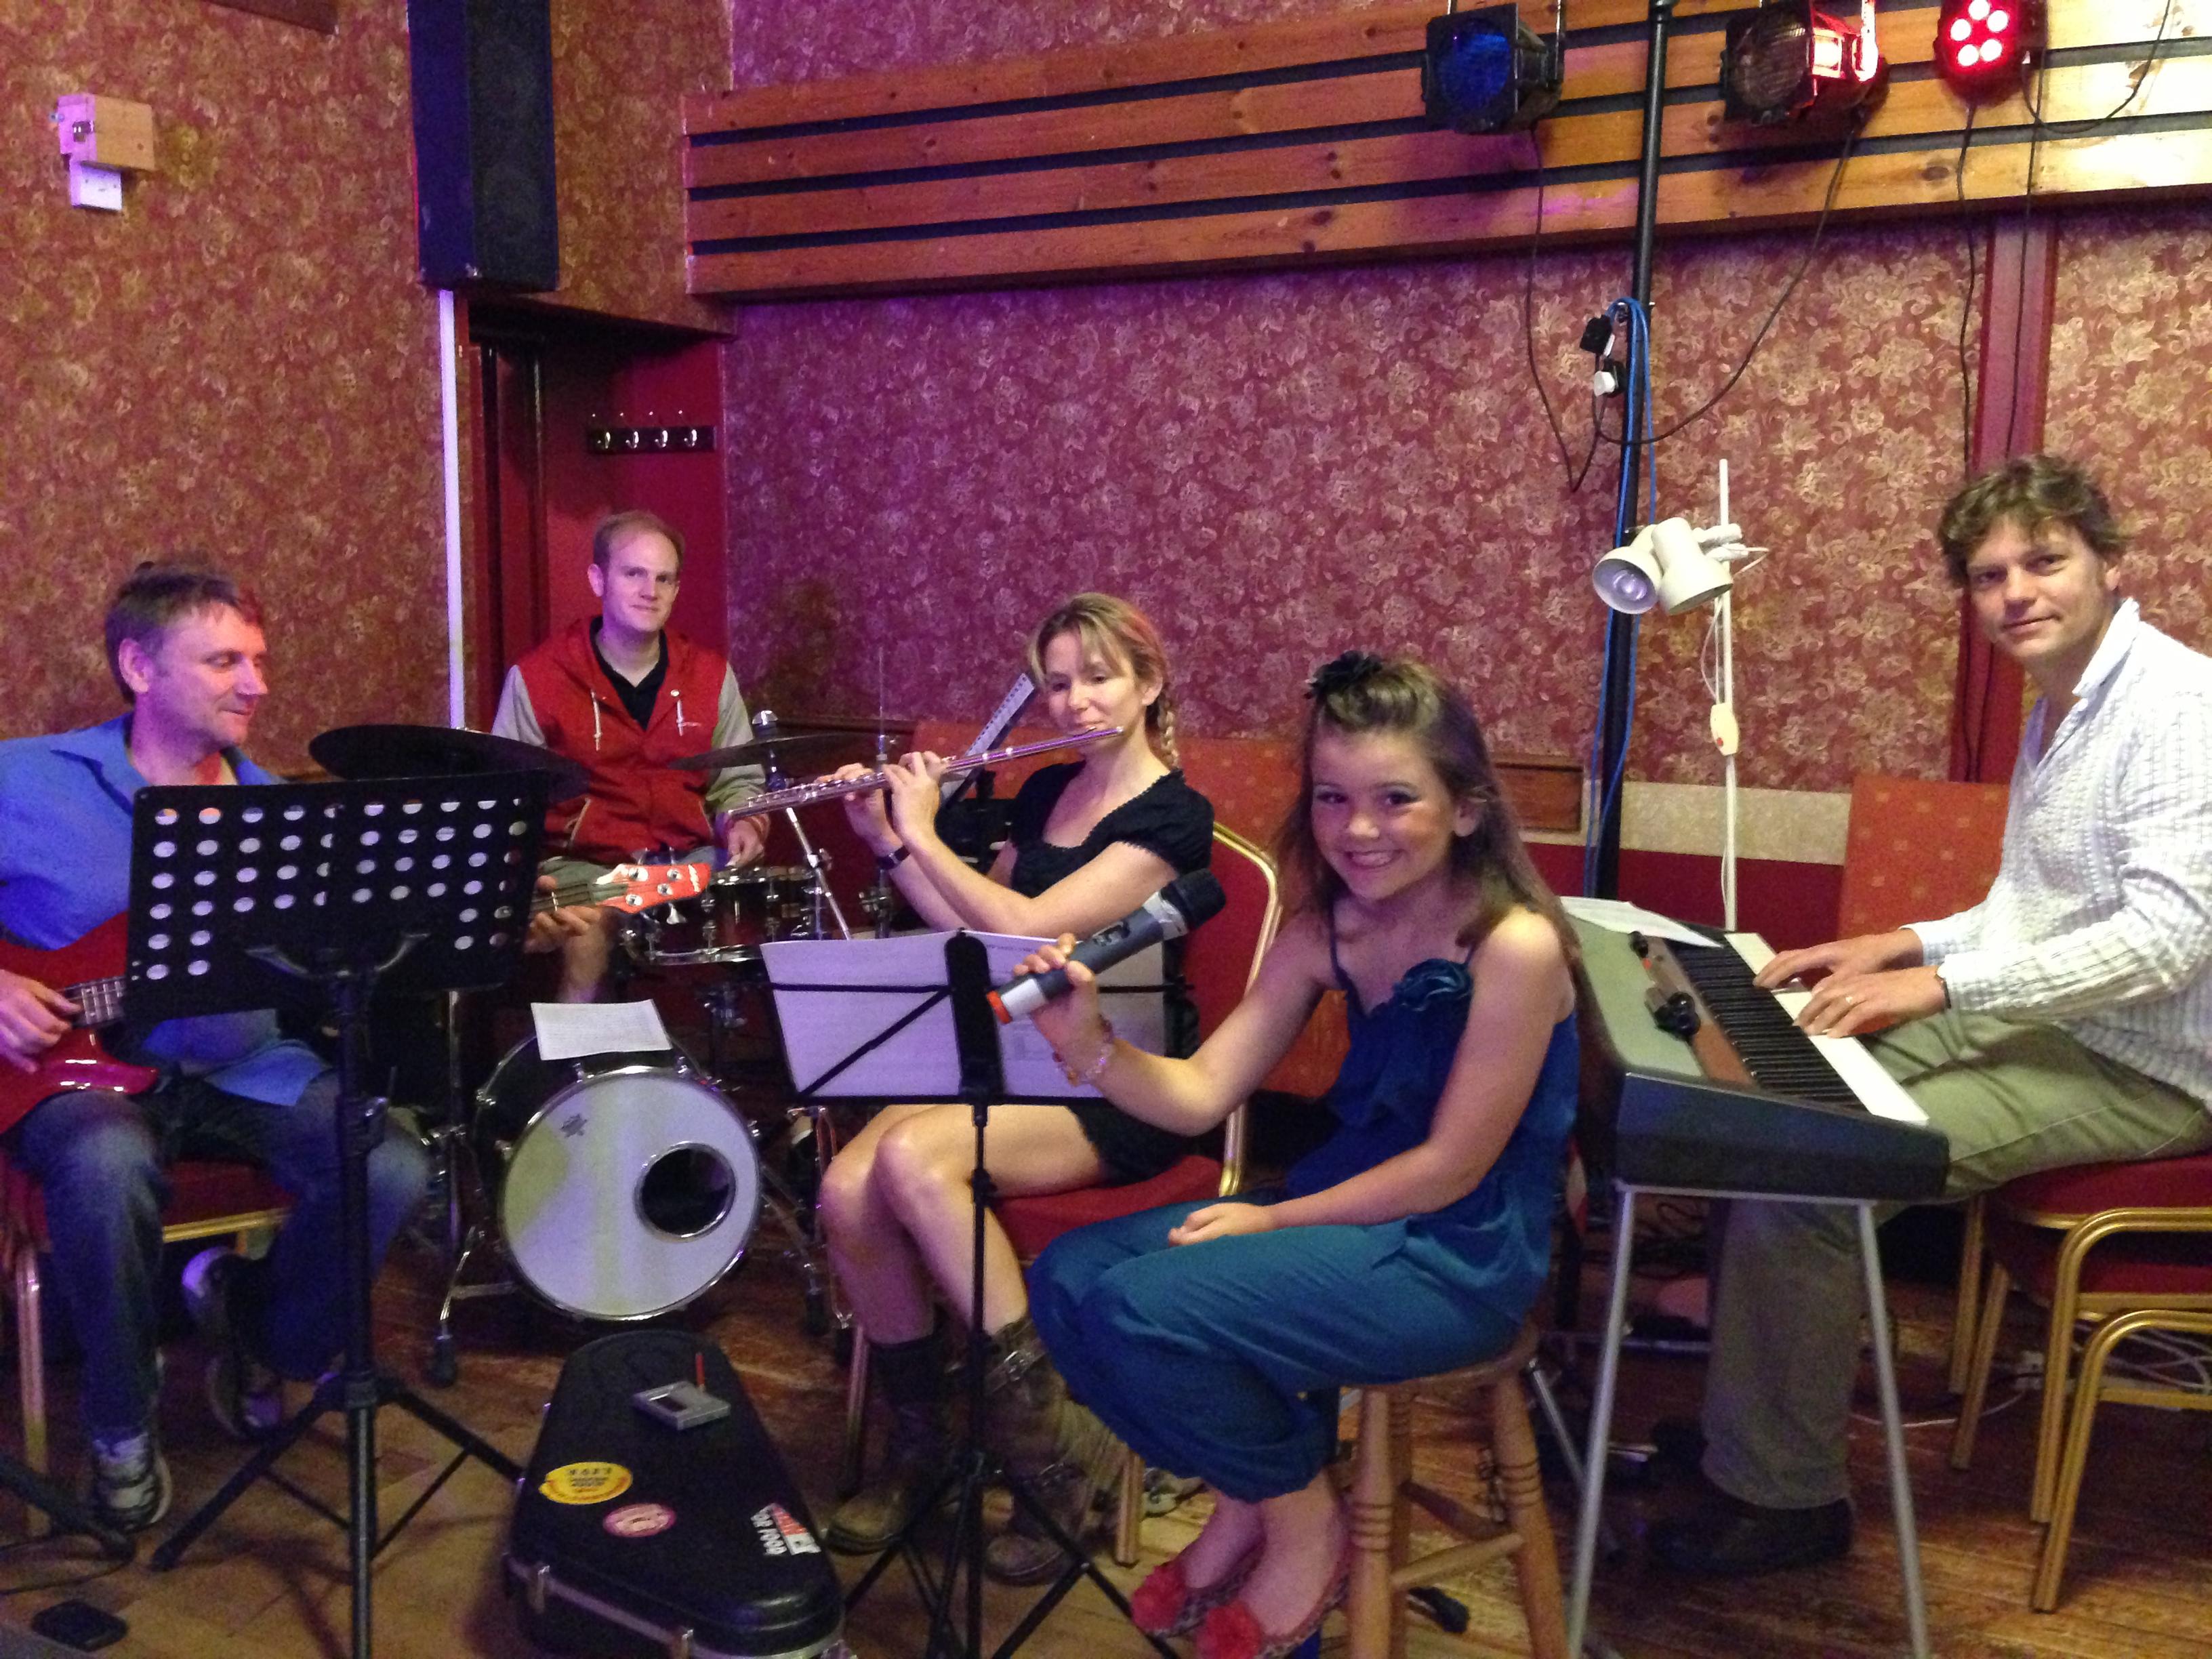 Elena Cobb Higgledy Piggledy Jazz Musical Photos